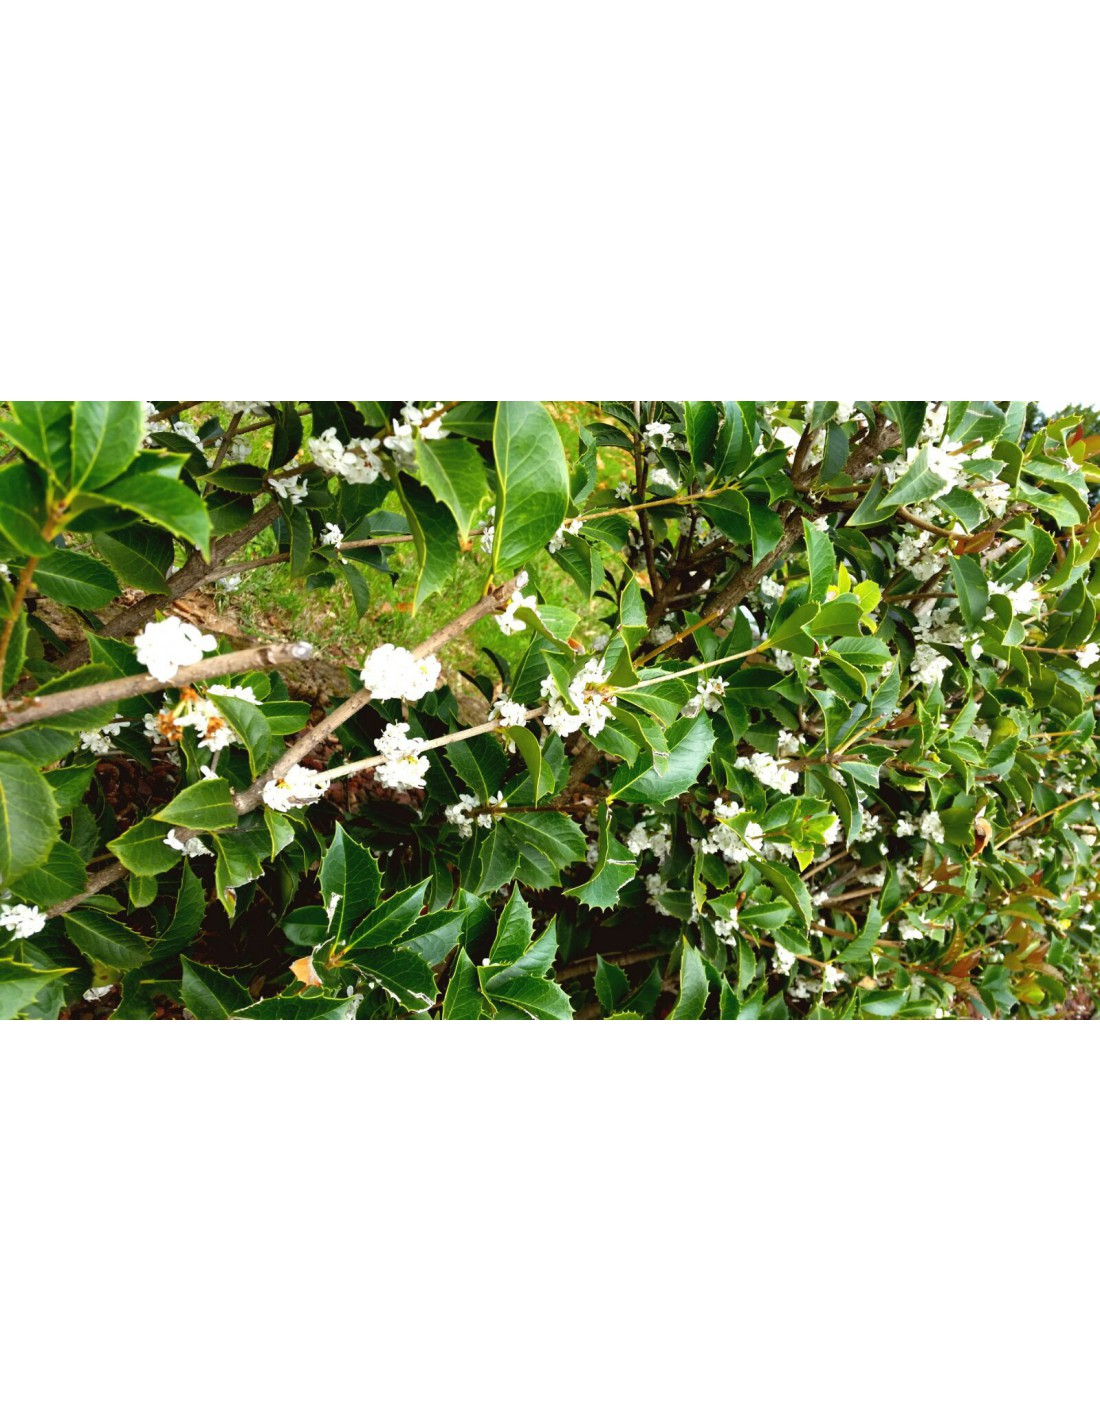 Piante Da Tartufo Bianco : Osmanto olea osmanthus fragrans fiore bianco